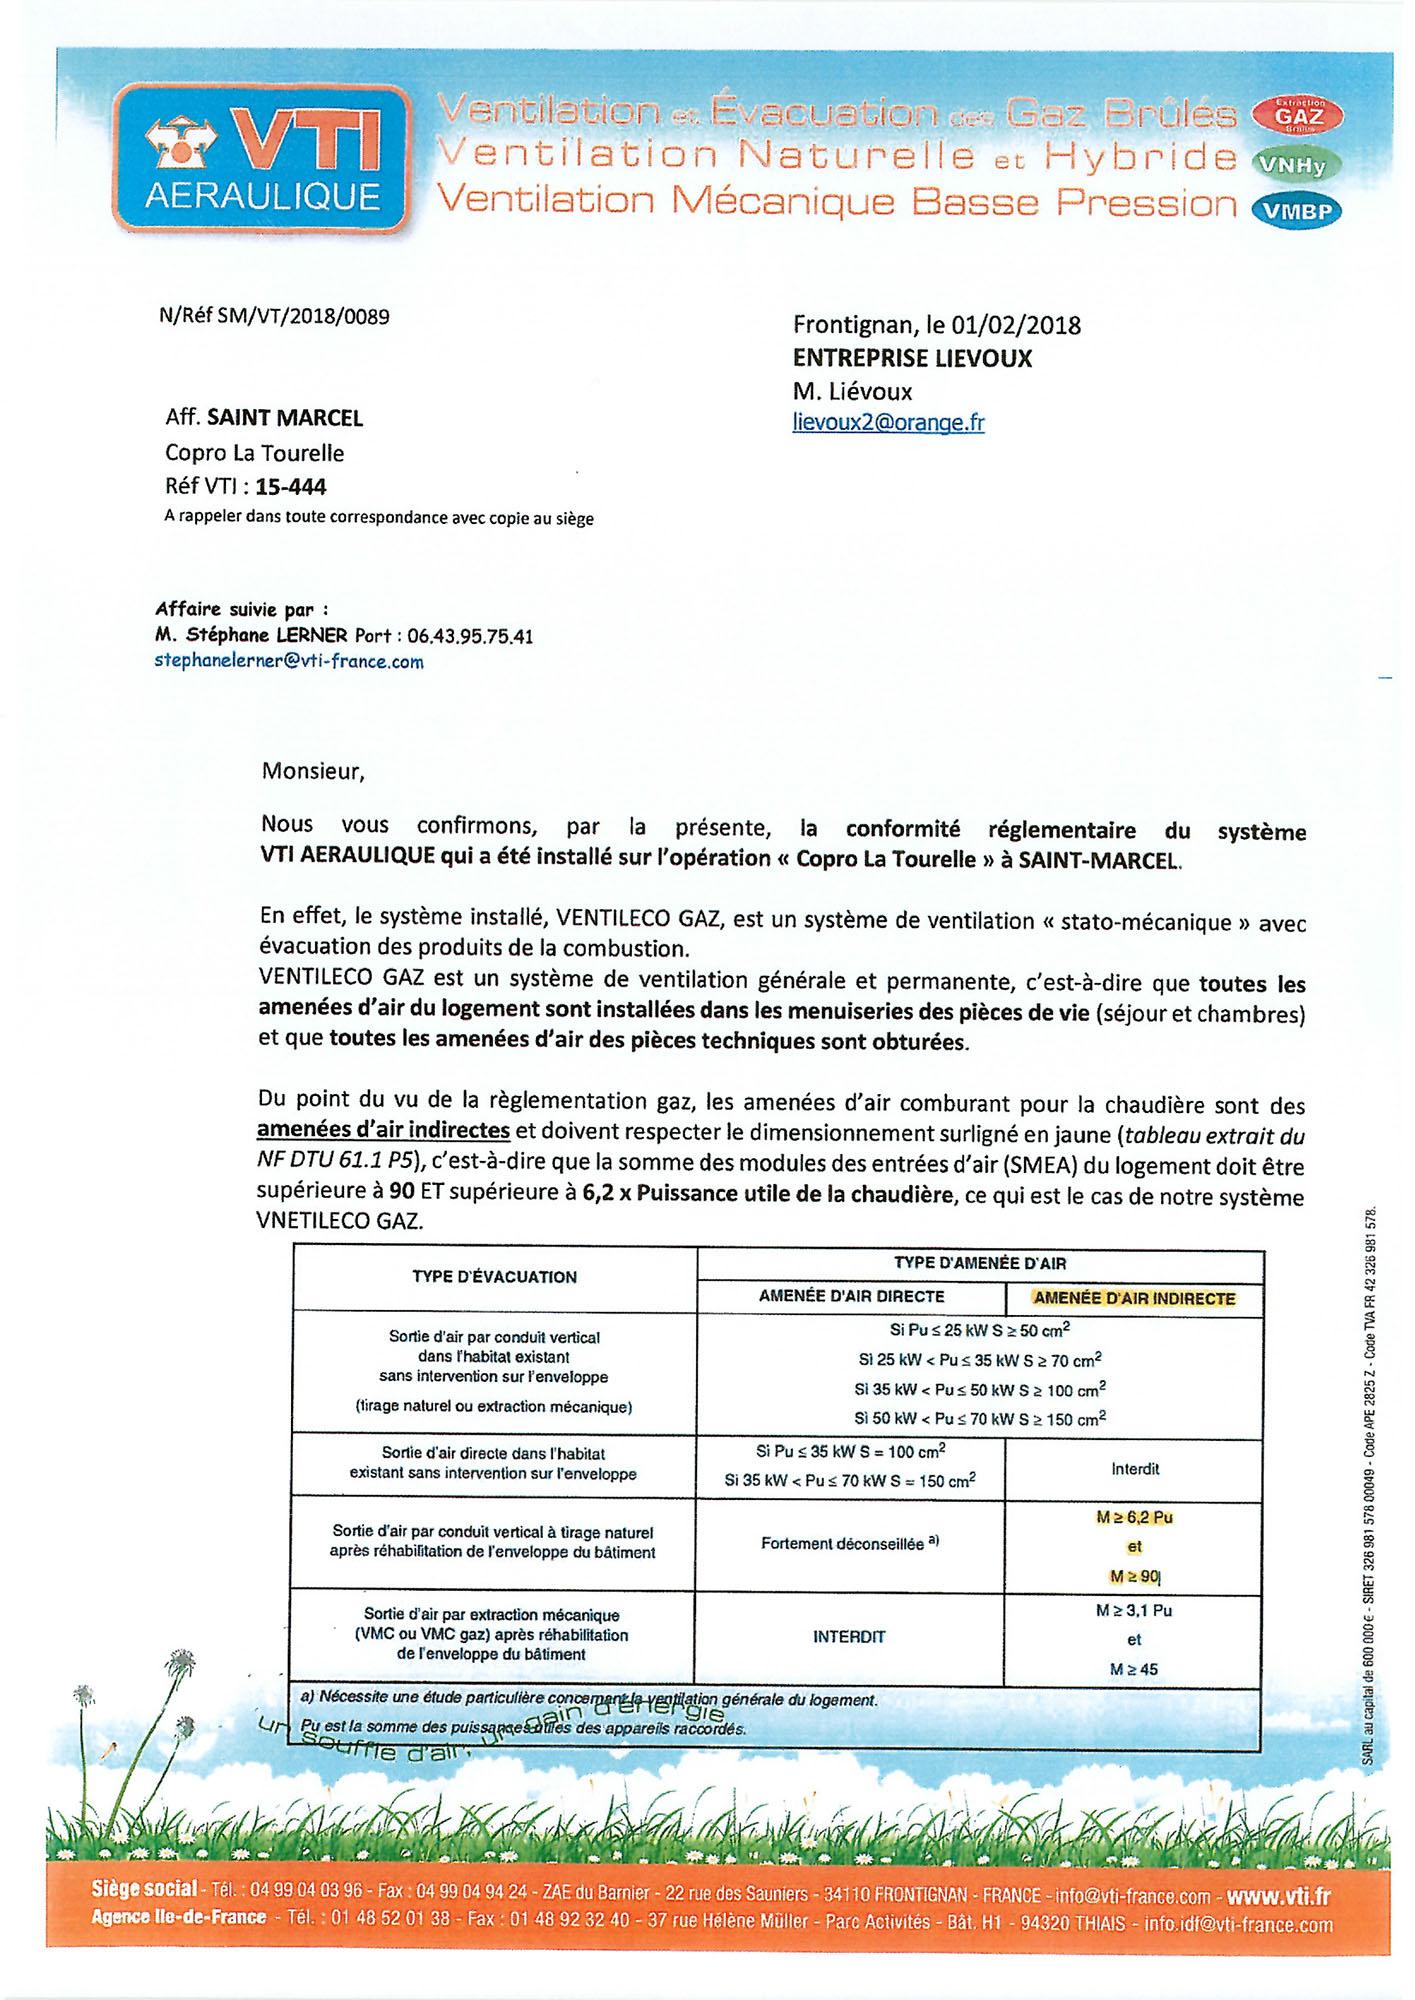 Certificat de conformit de la ventilation copro la - Certificat de conformite gaz ...